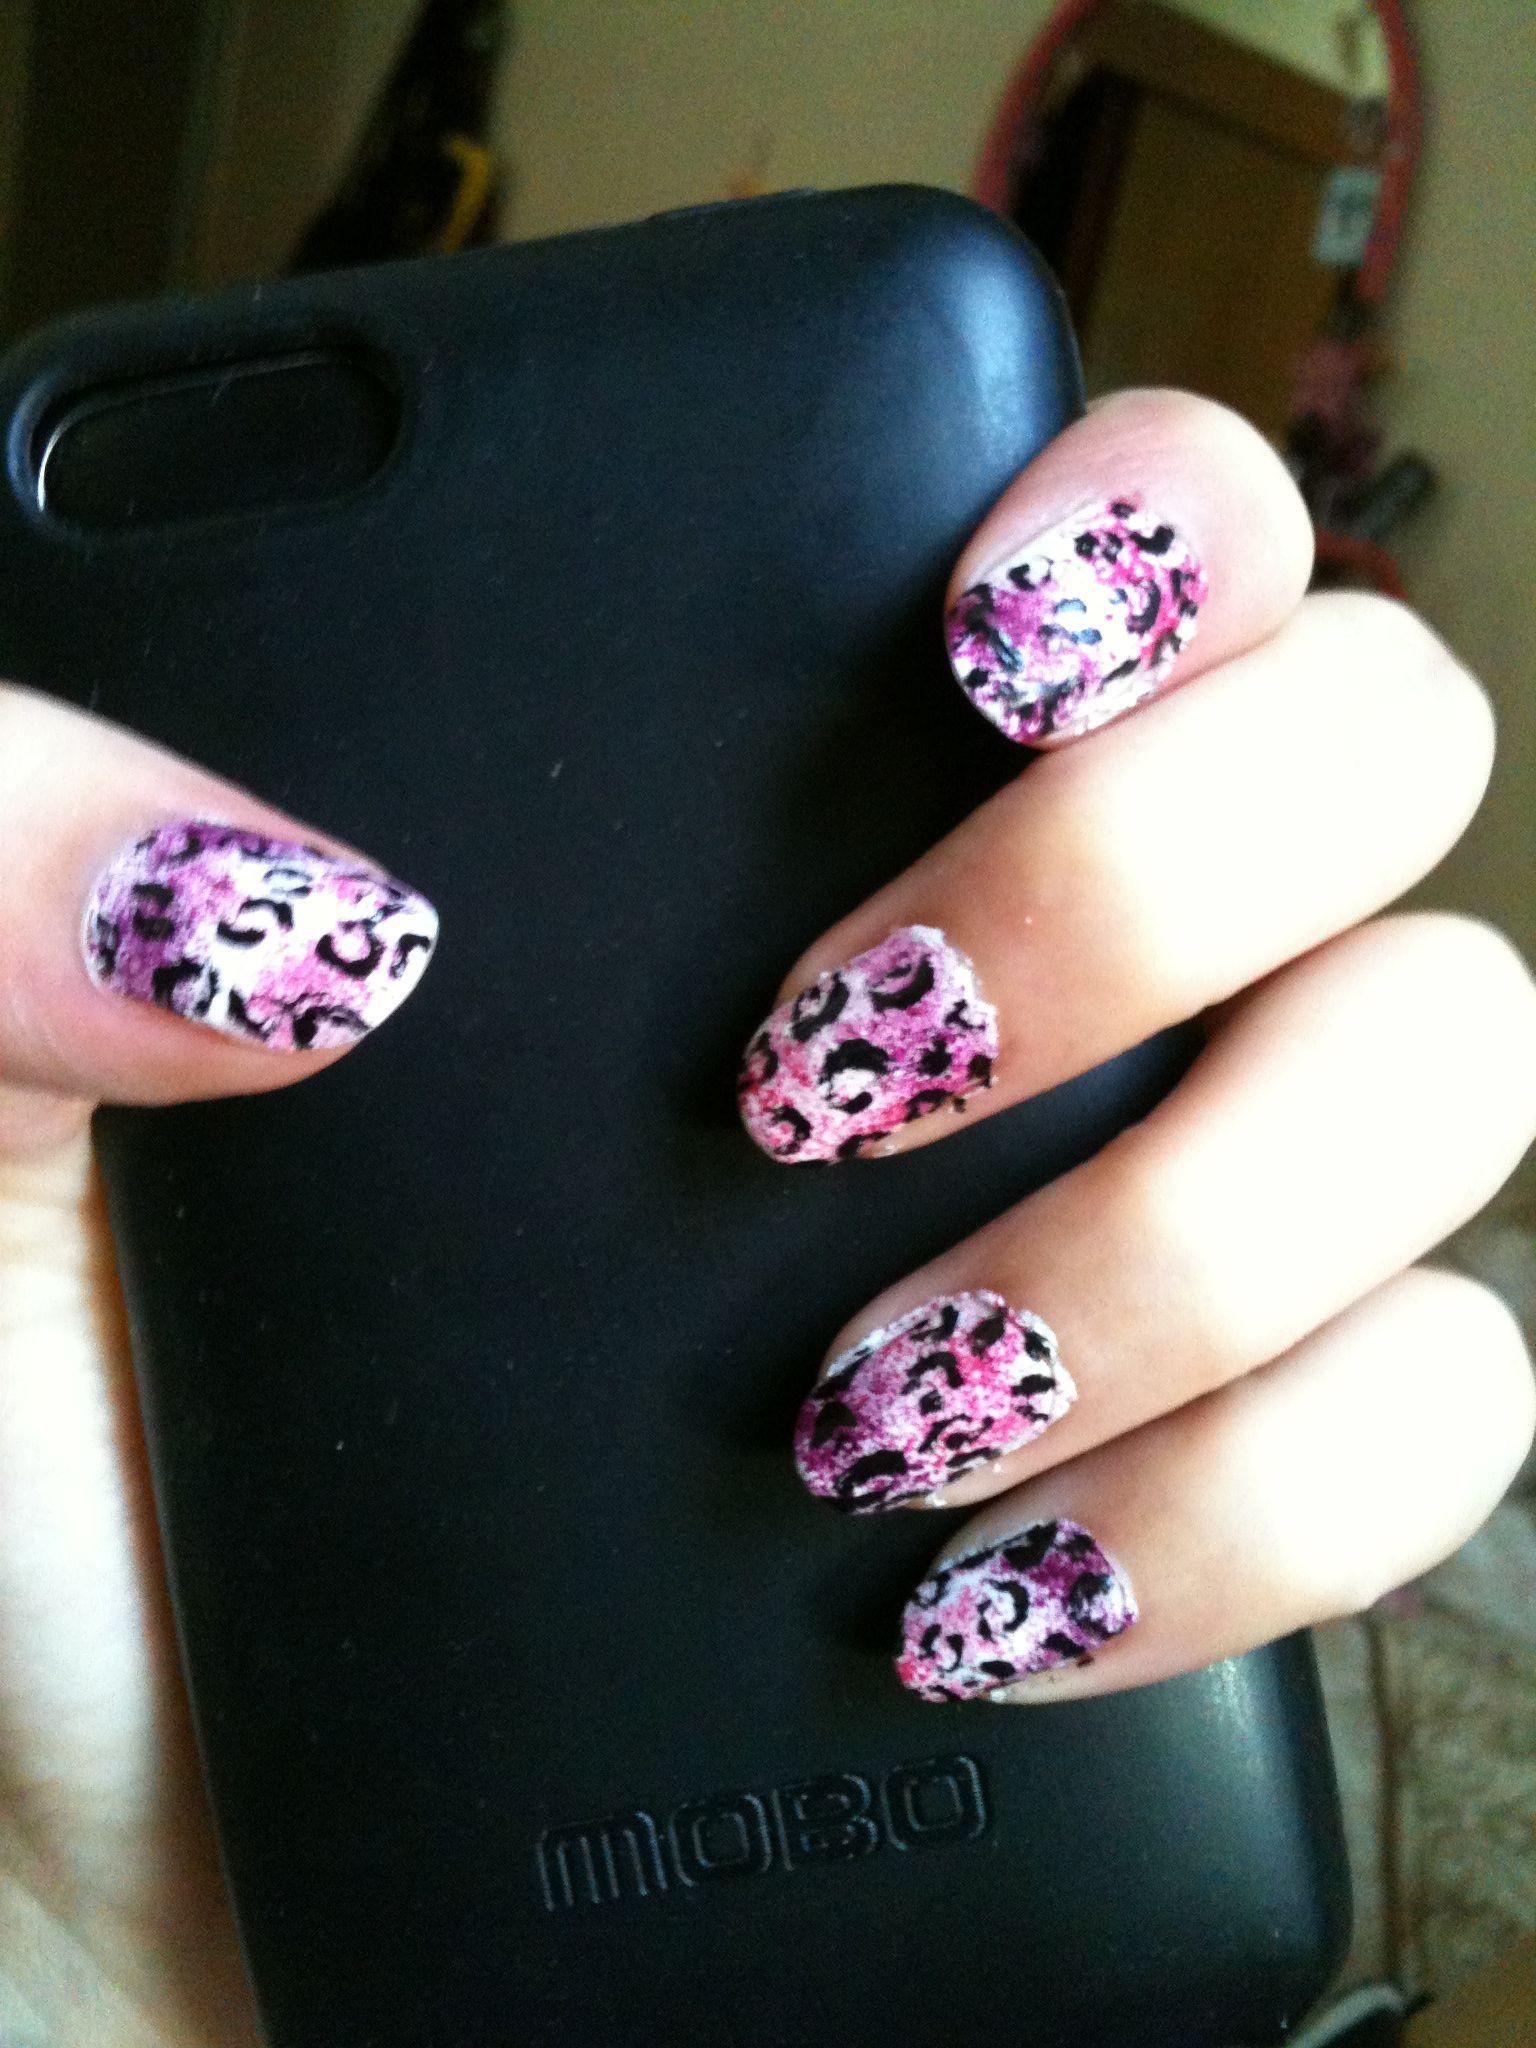 Forums | Zebra nails, Animal print nails art, Animal print